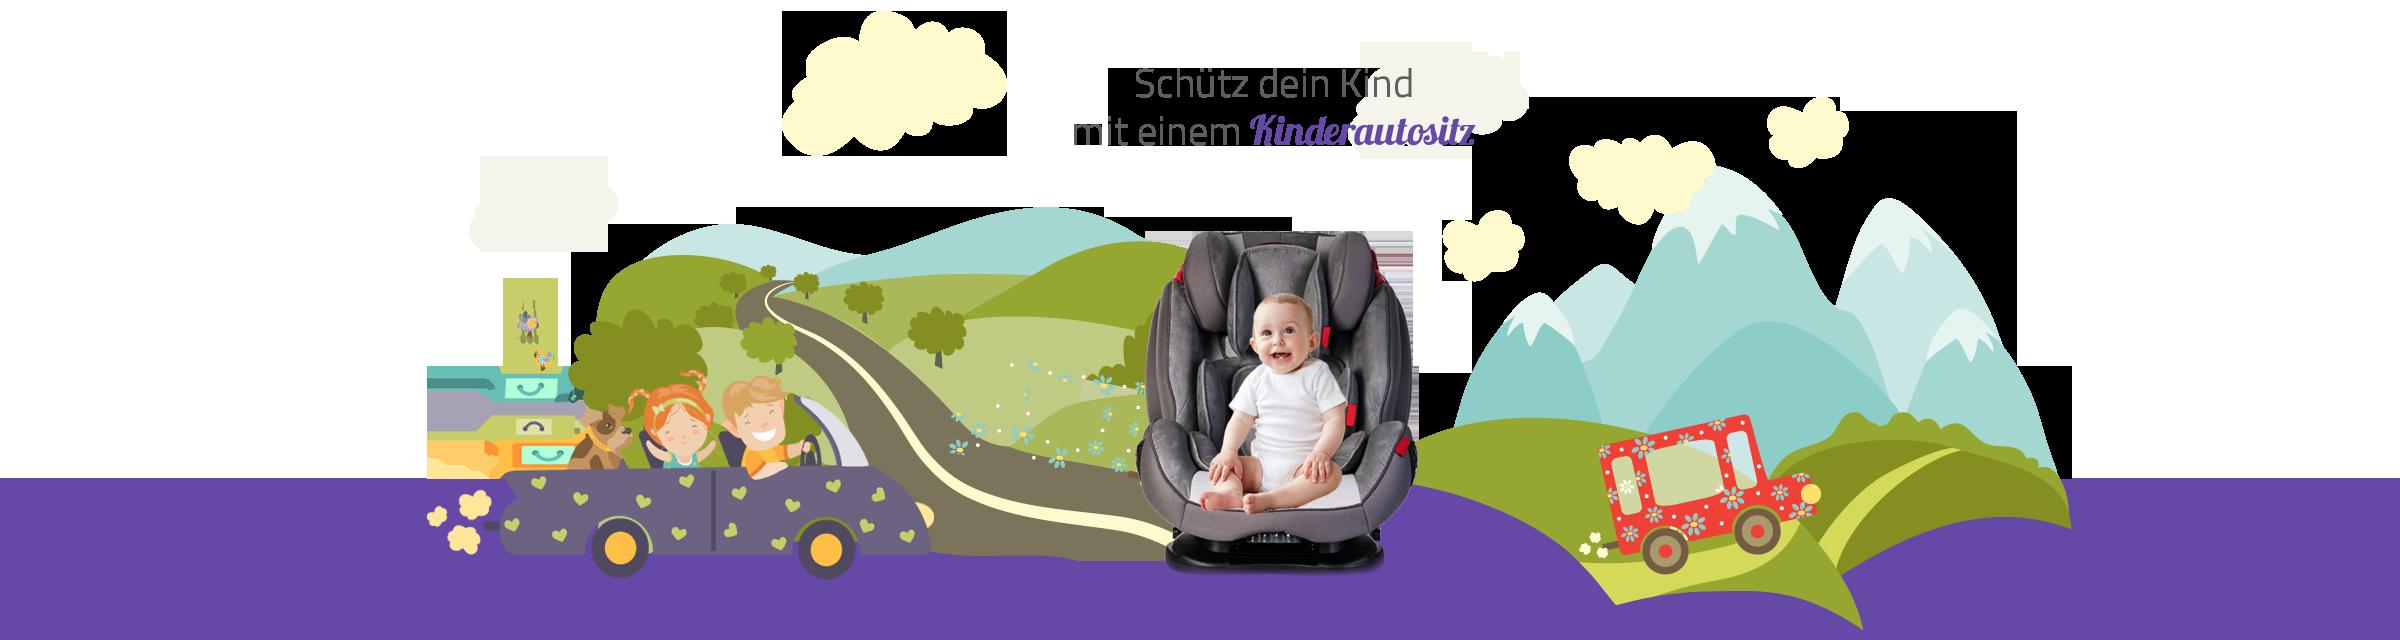 Autokindersitze online kaufen auf Auto-Kindersitze.net